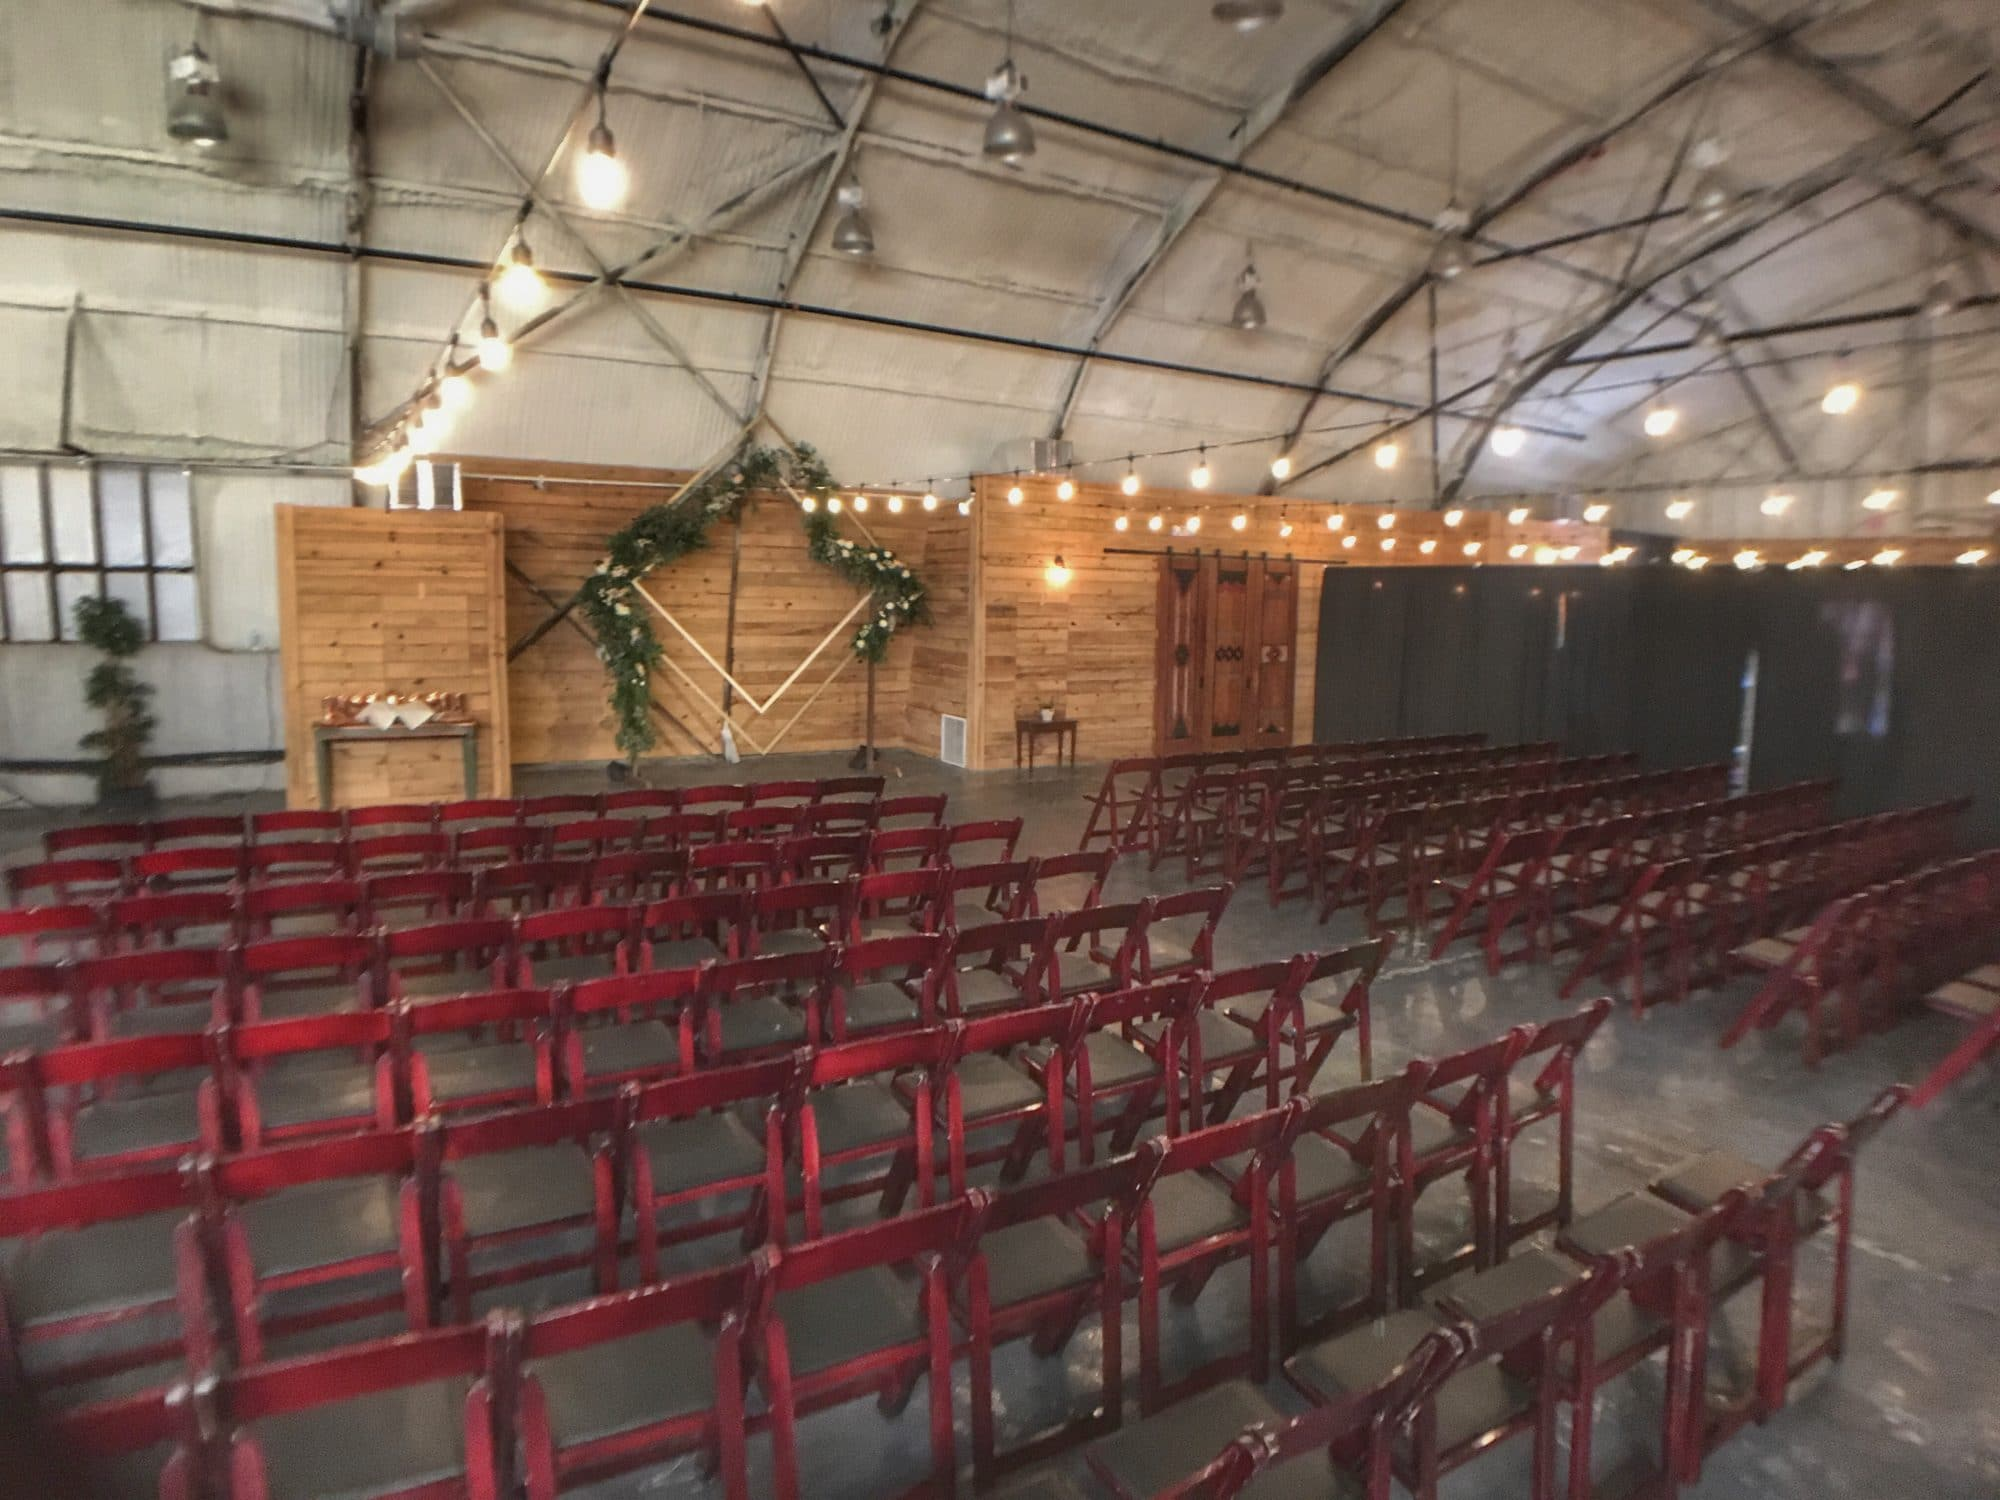 1010 West - rustic pallet wall backdrop to wedding venue inside hangar